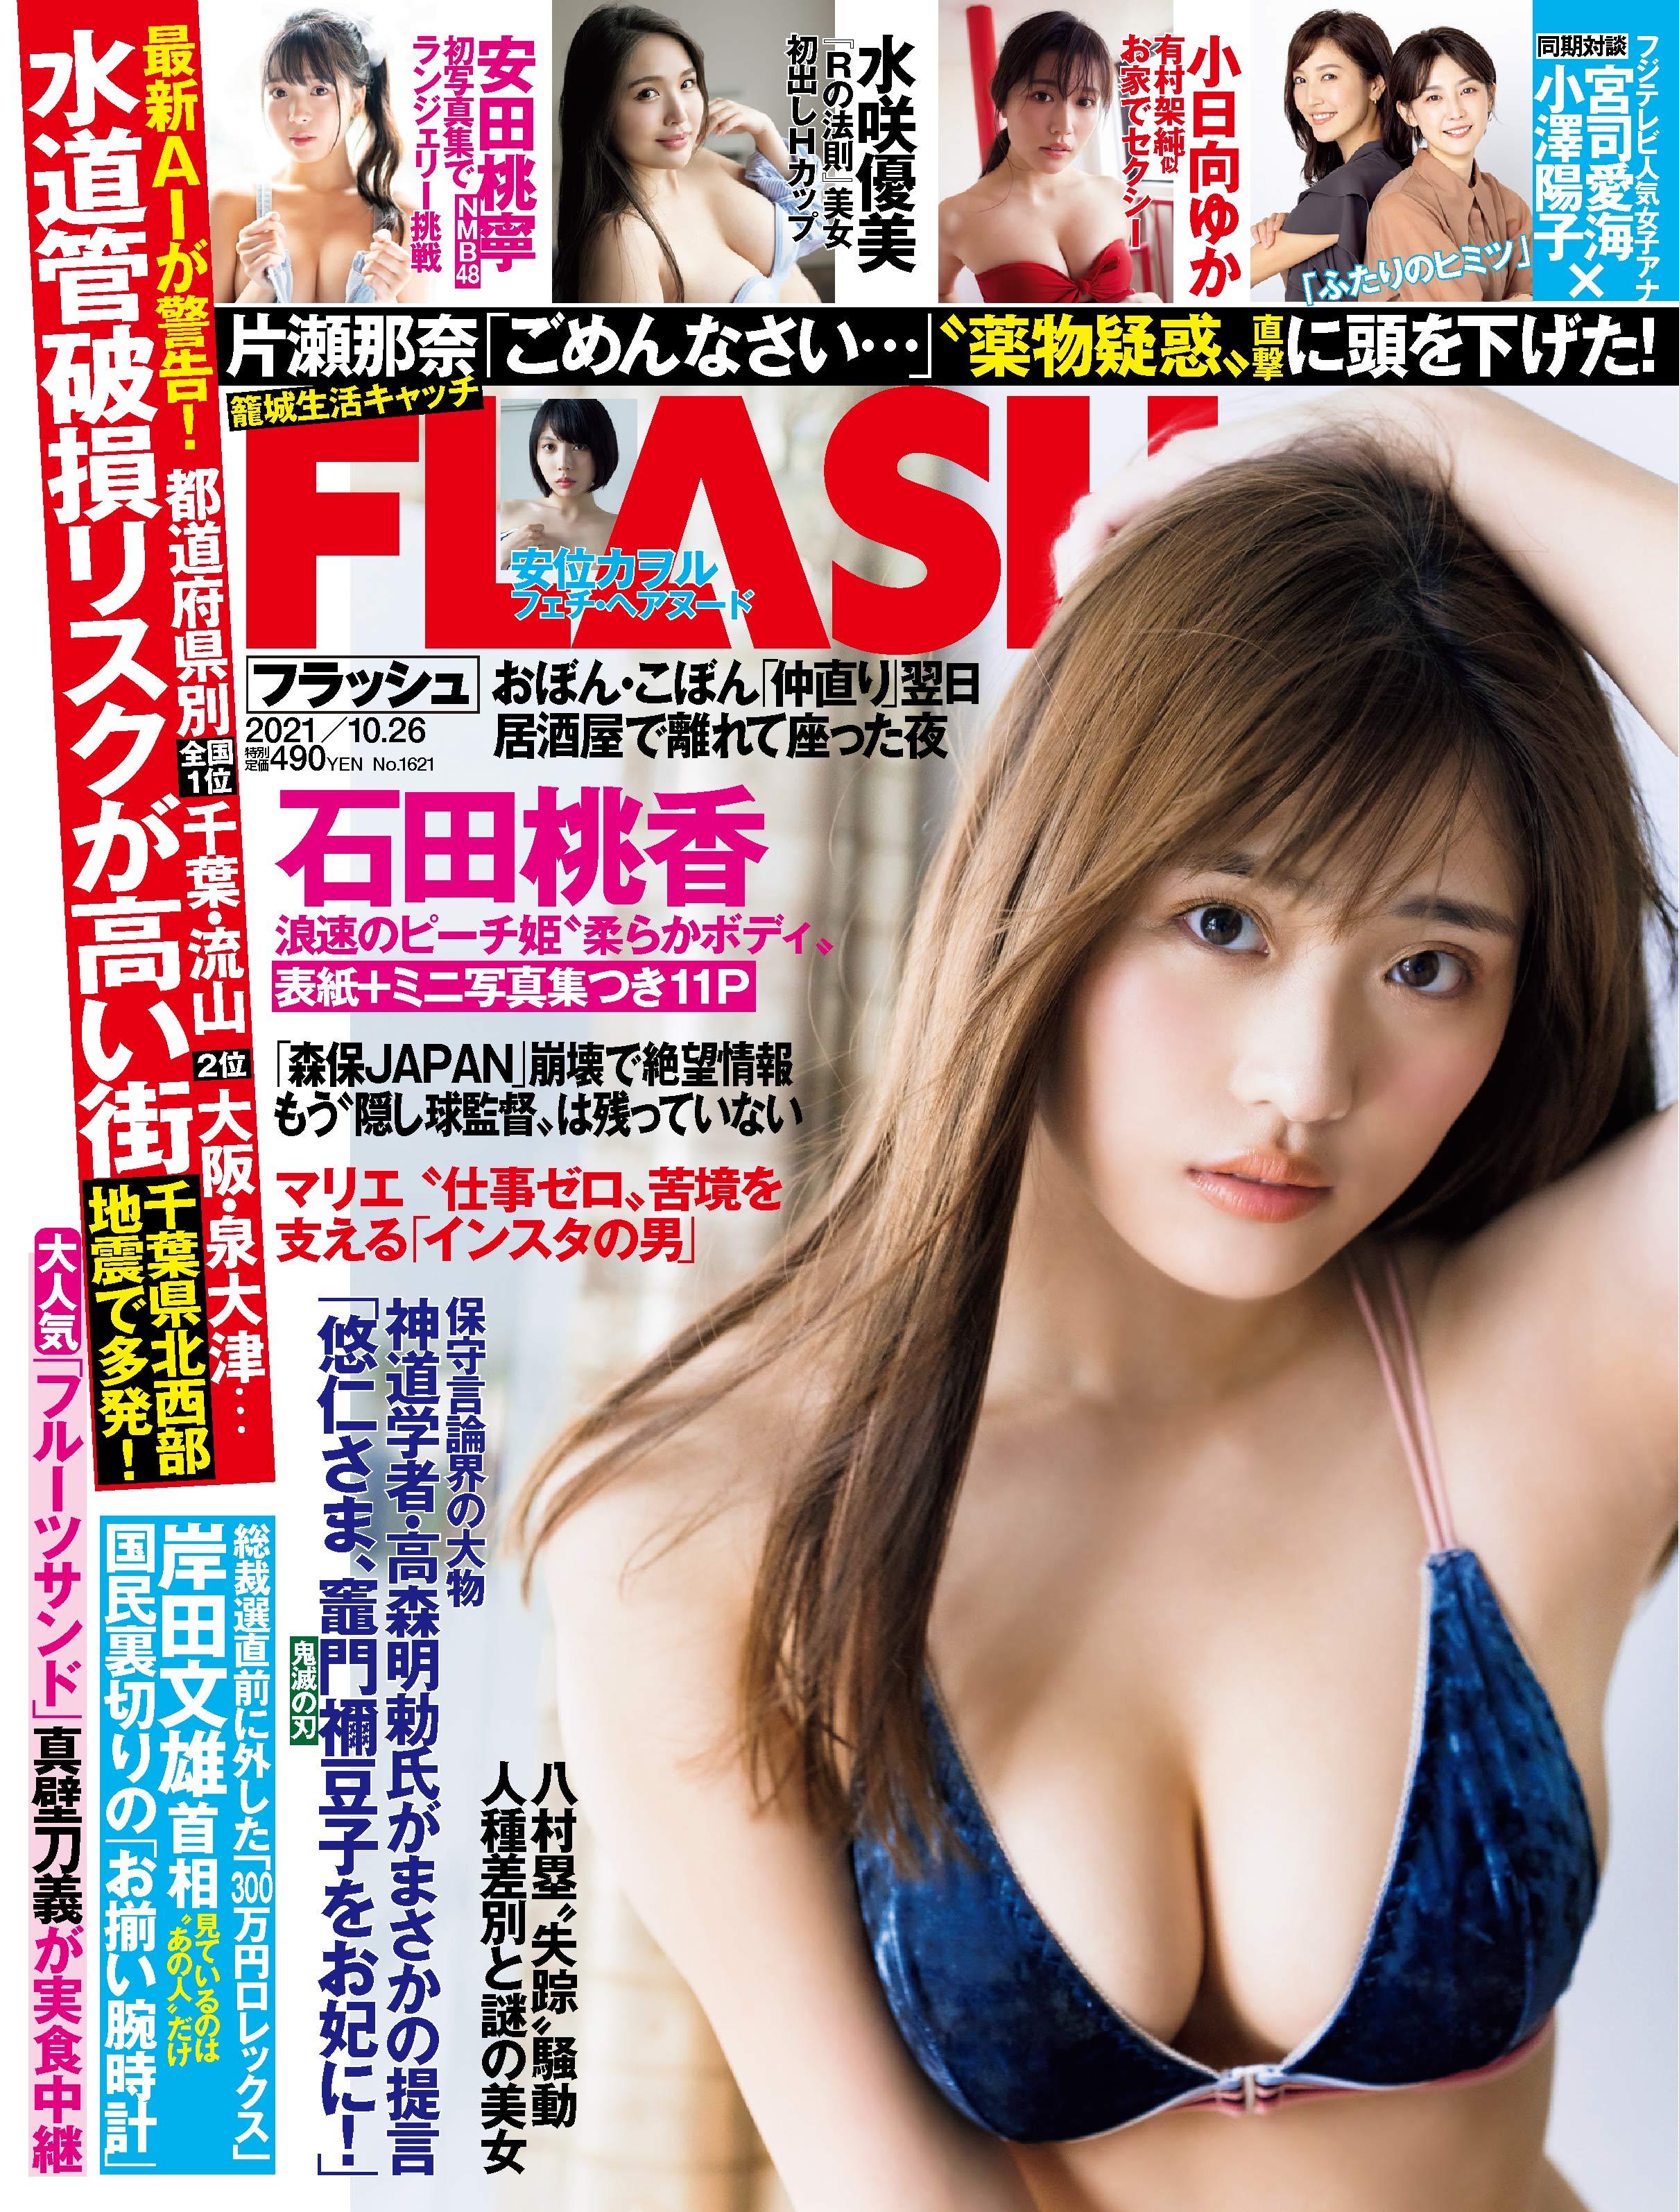 『FLASH』10月12日発売号表紙 (C)光文社/週刊FLASH